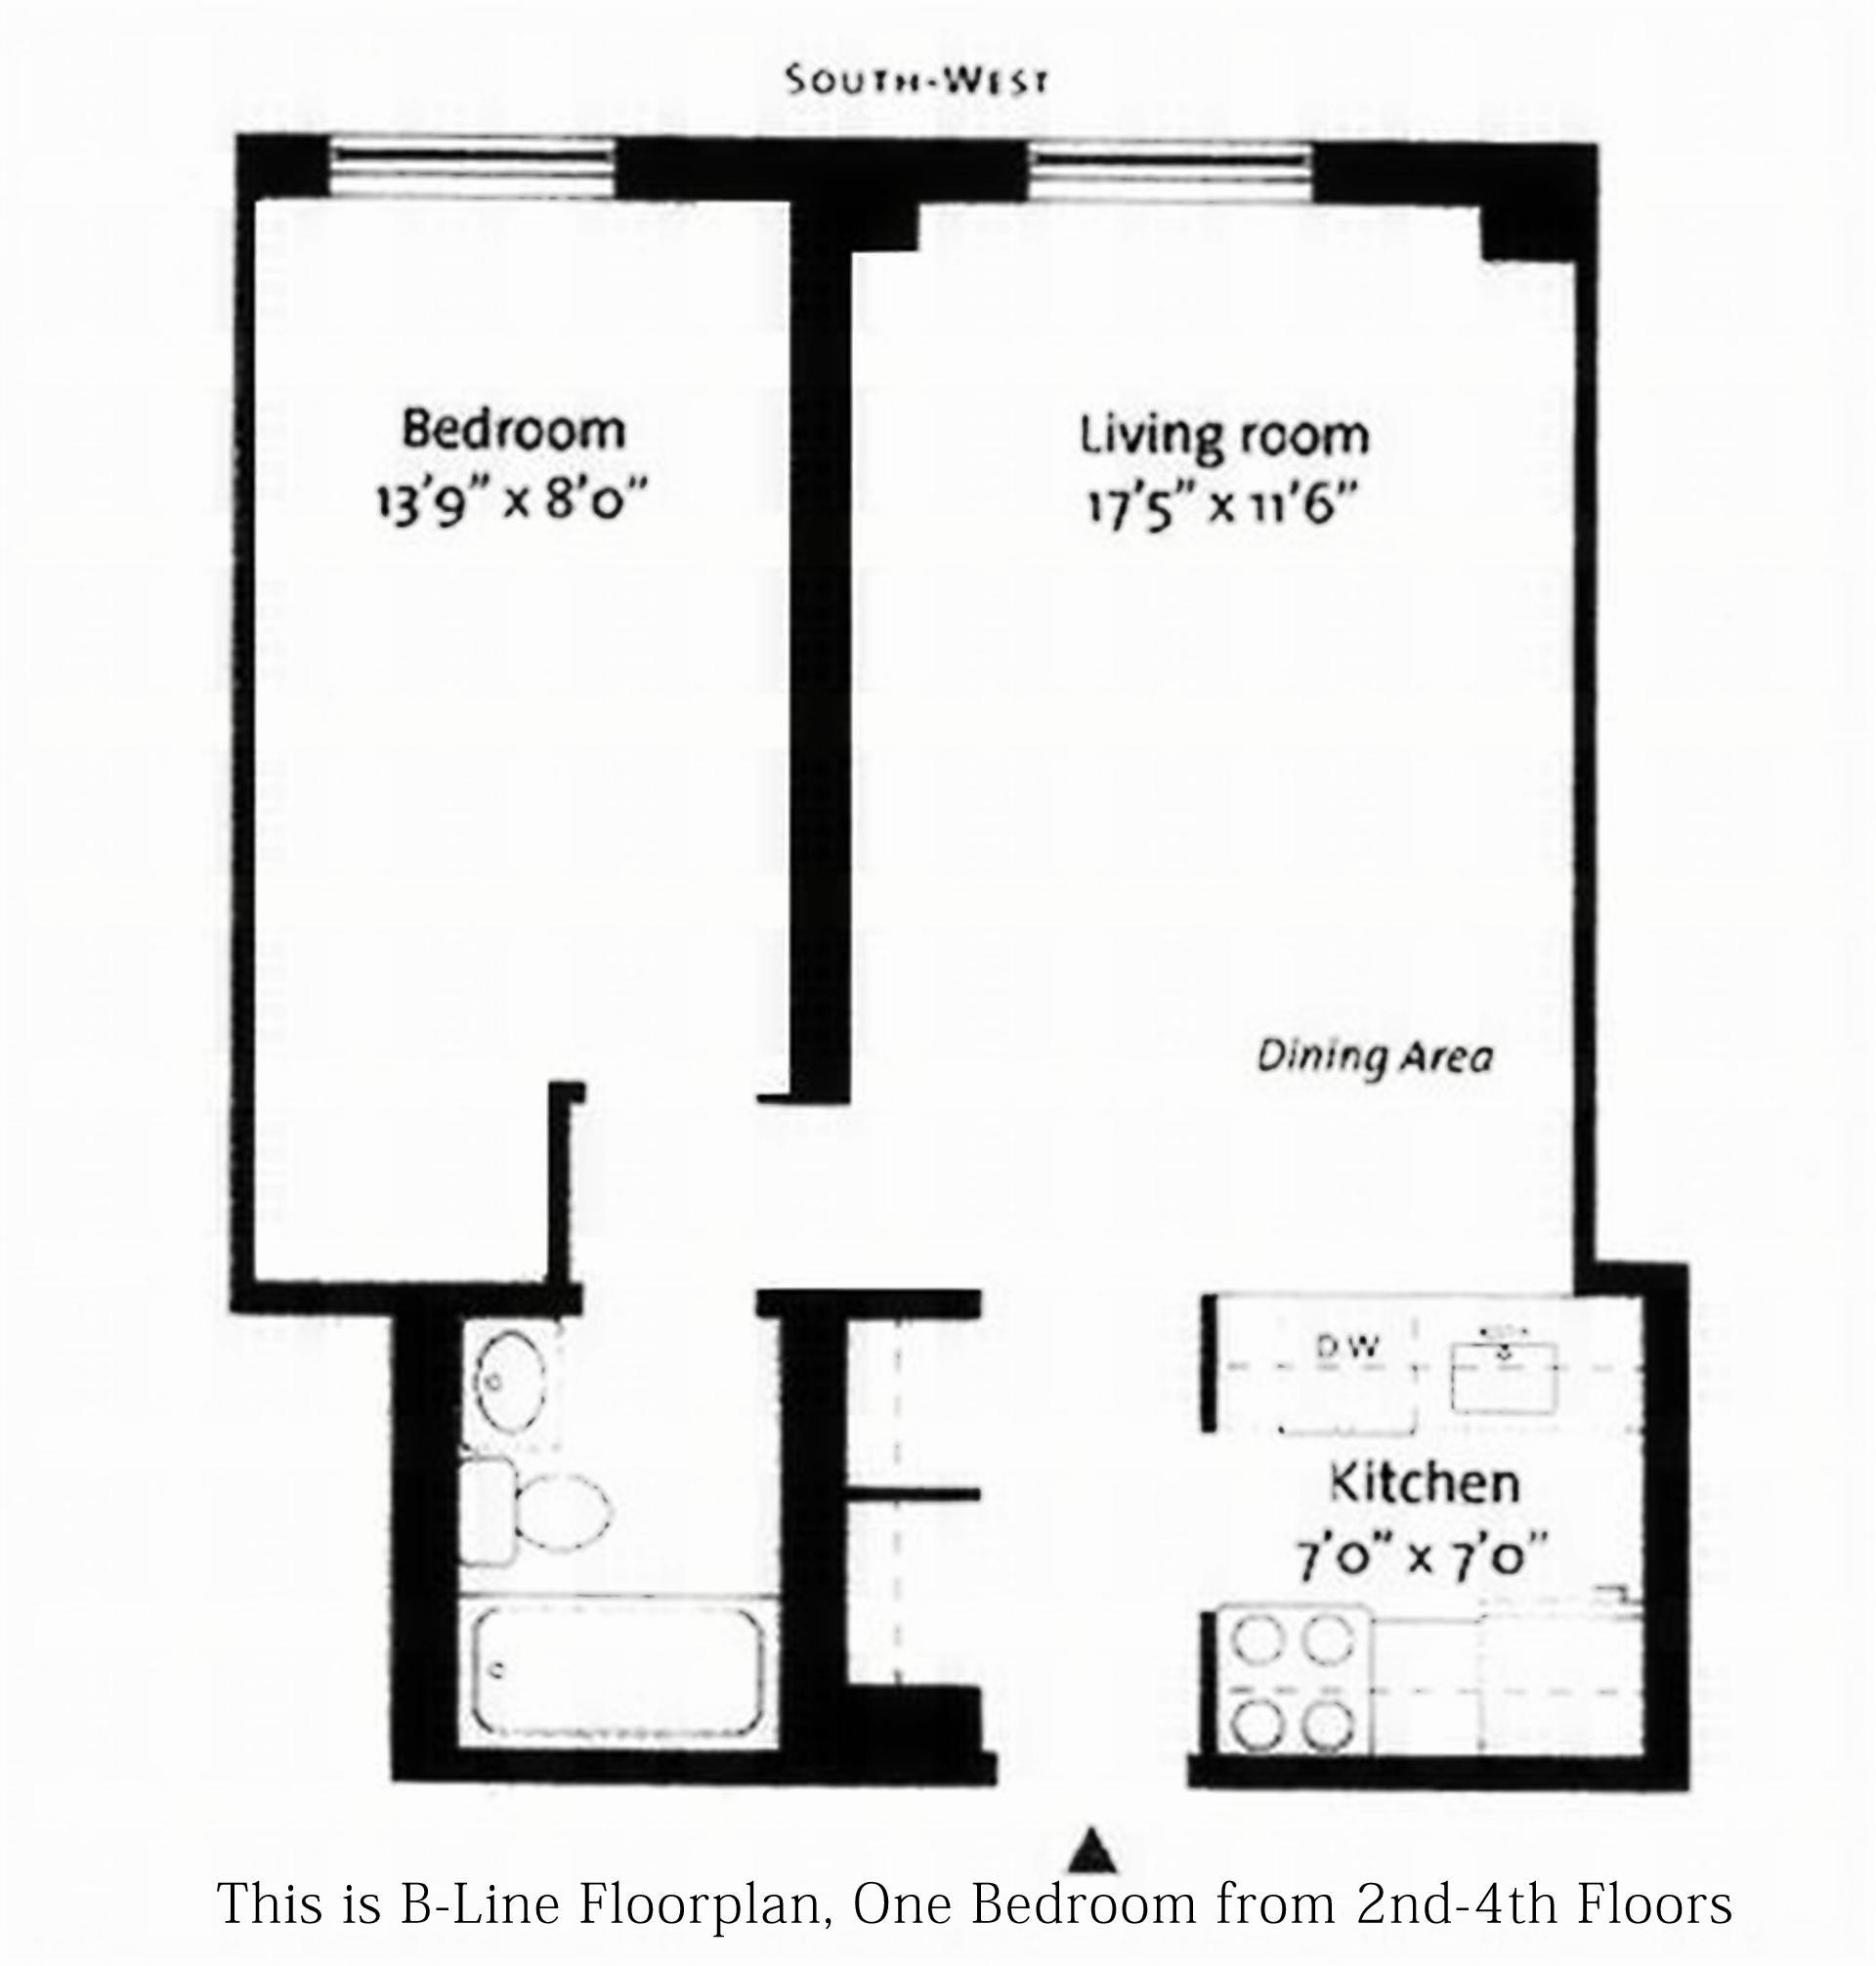 Average Studio Apartment Layout average bedroom size square feet